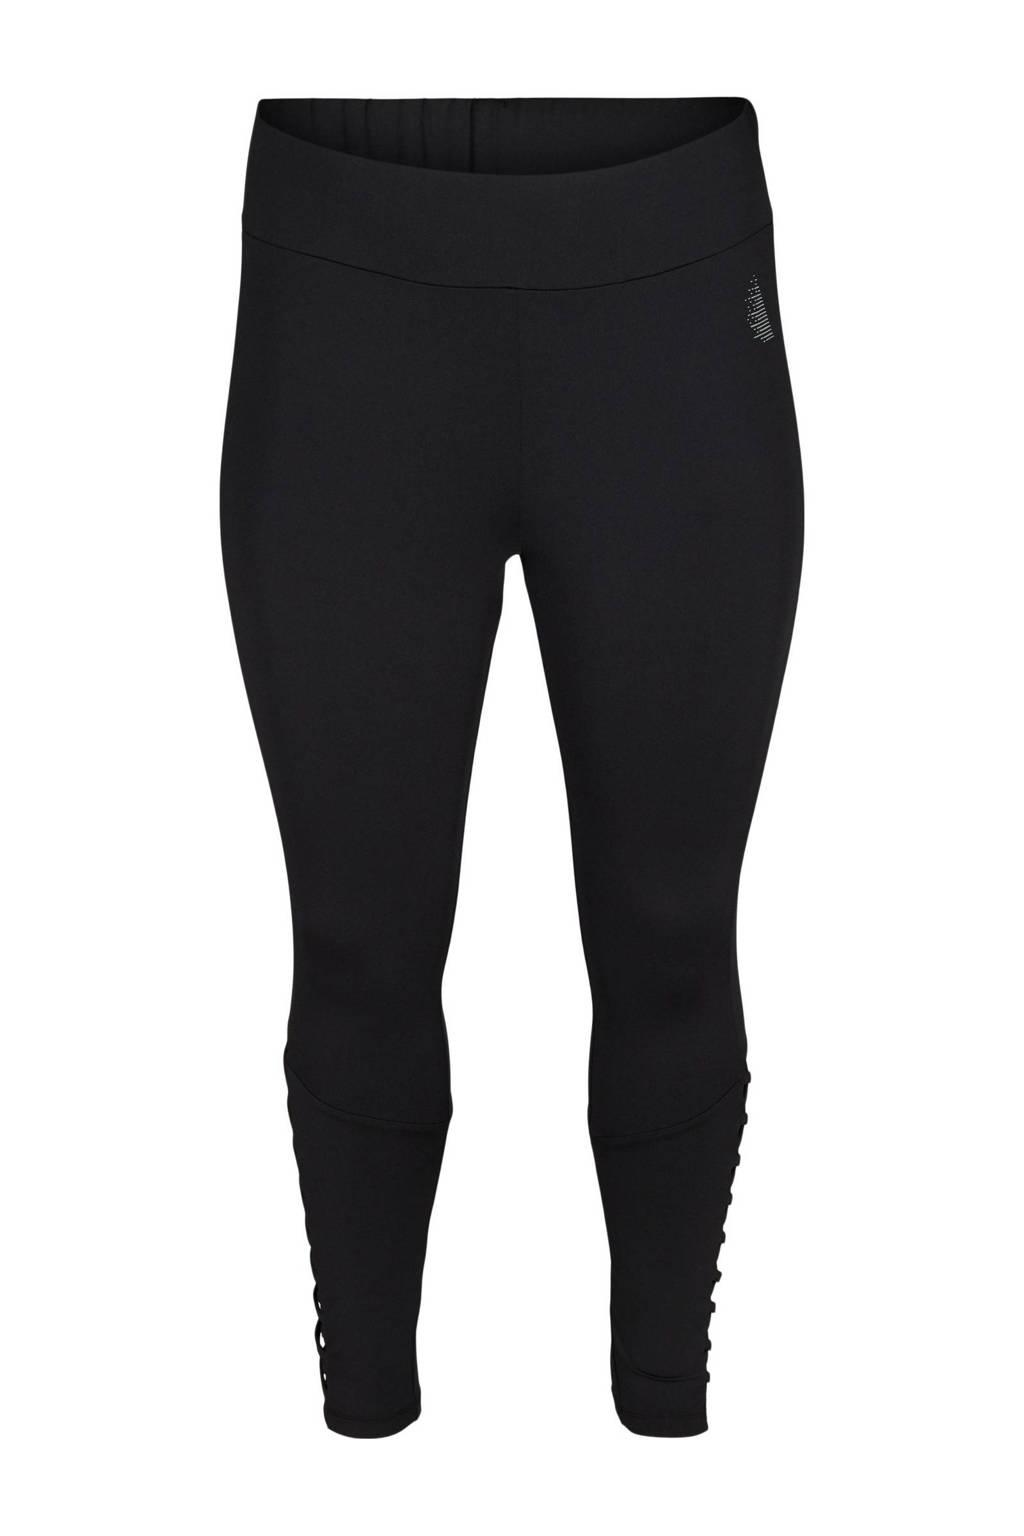 ACTIVE By Zizzi Plus Size 7/8 sportlegging zwart, Zwart